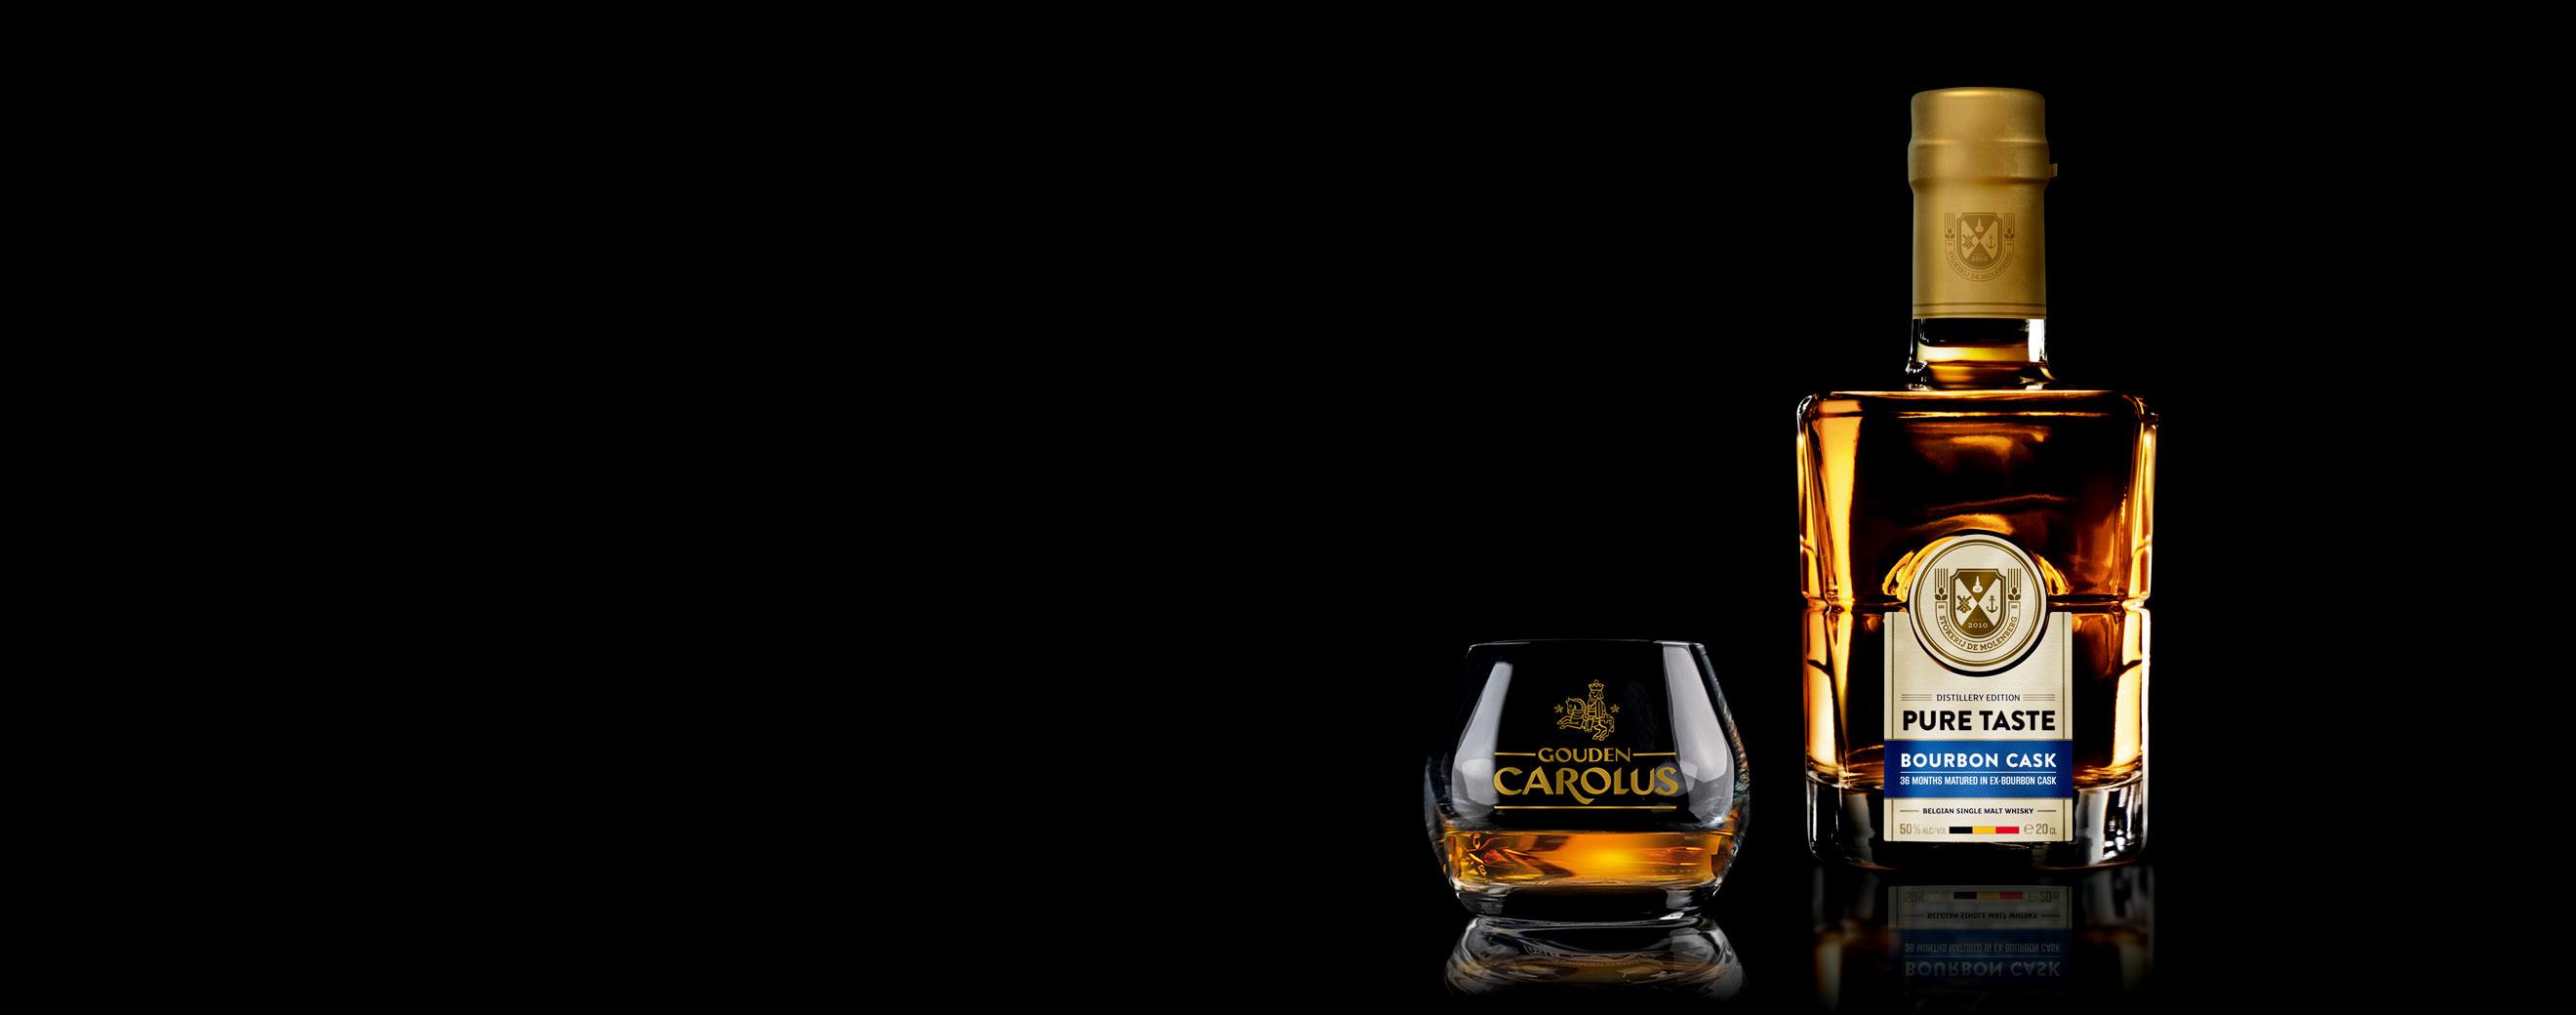 Pure Taste - Bourbon Cask Whisky Stokerij De Molenberg met glas